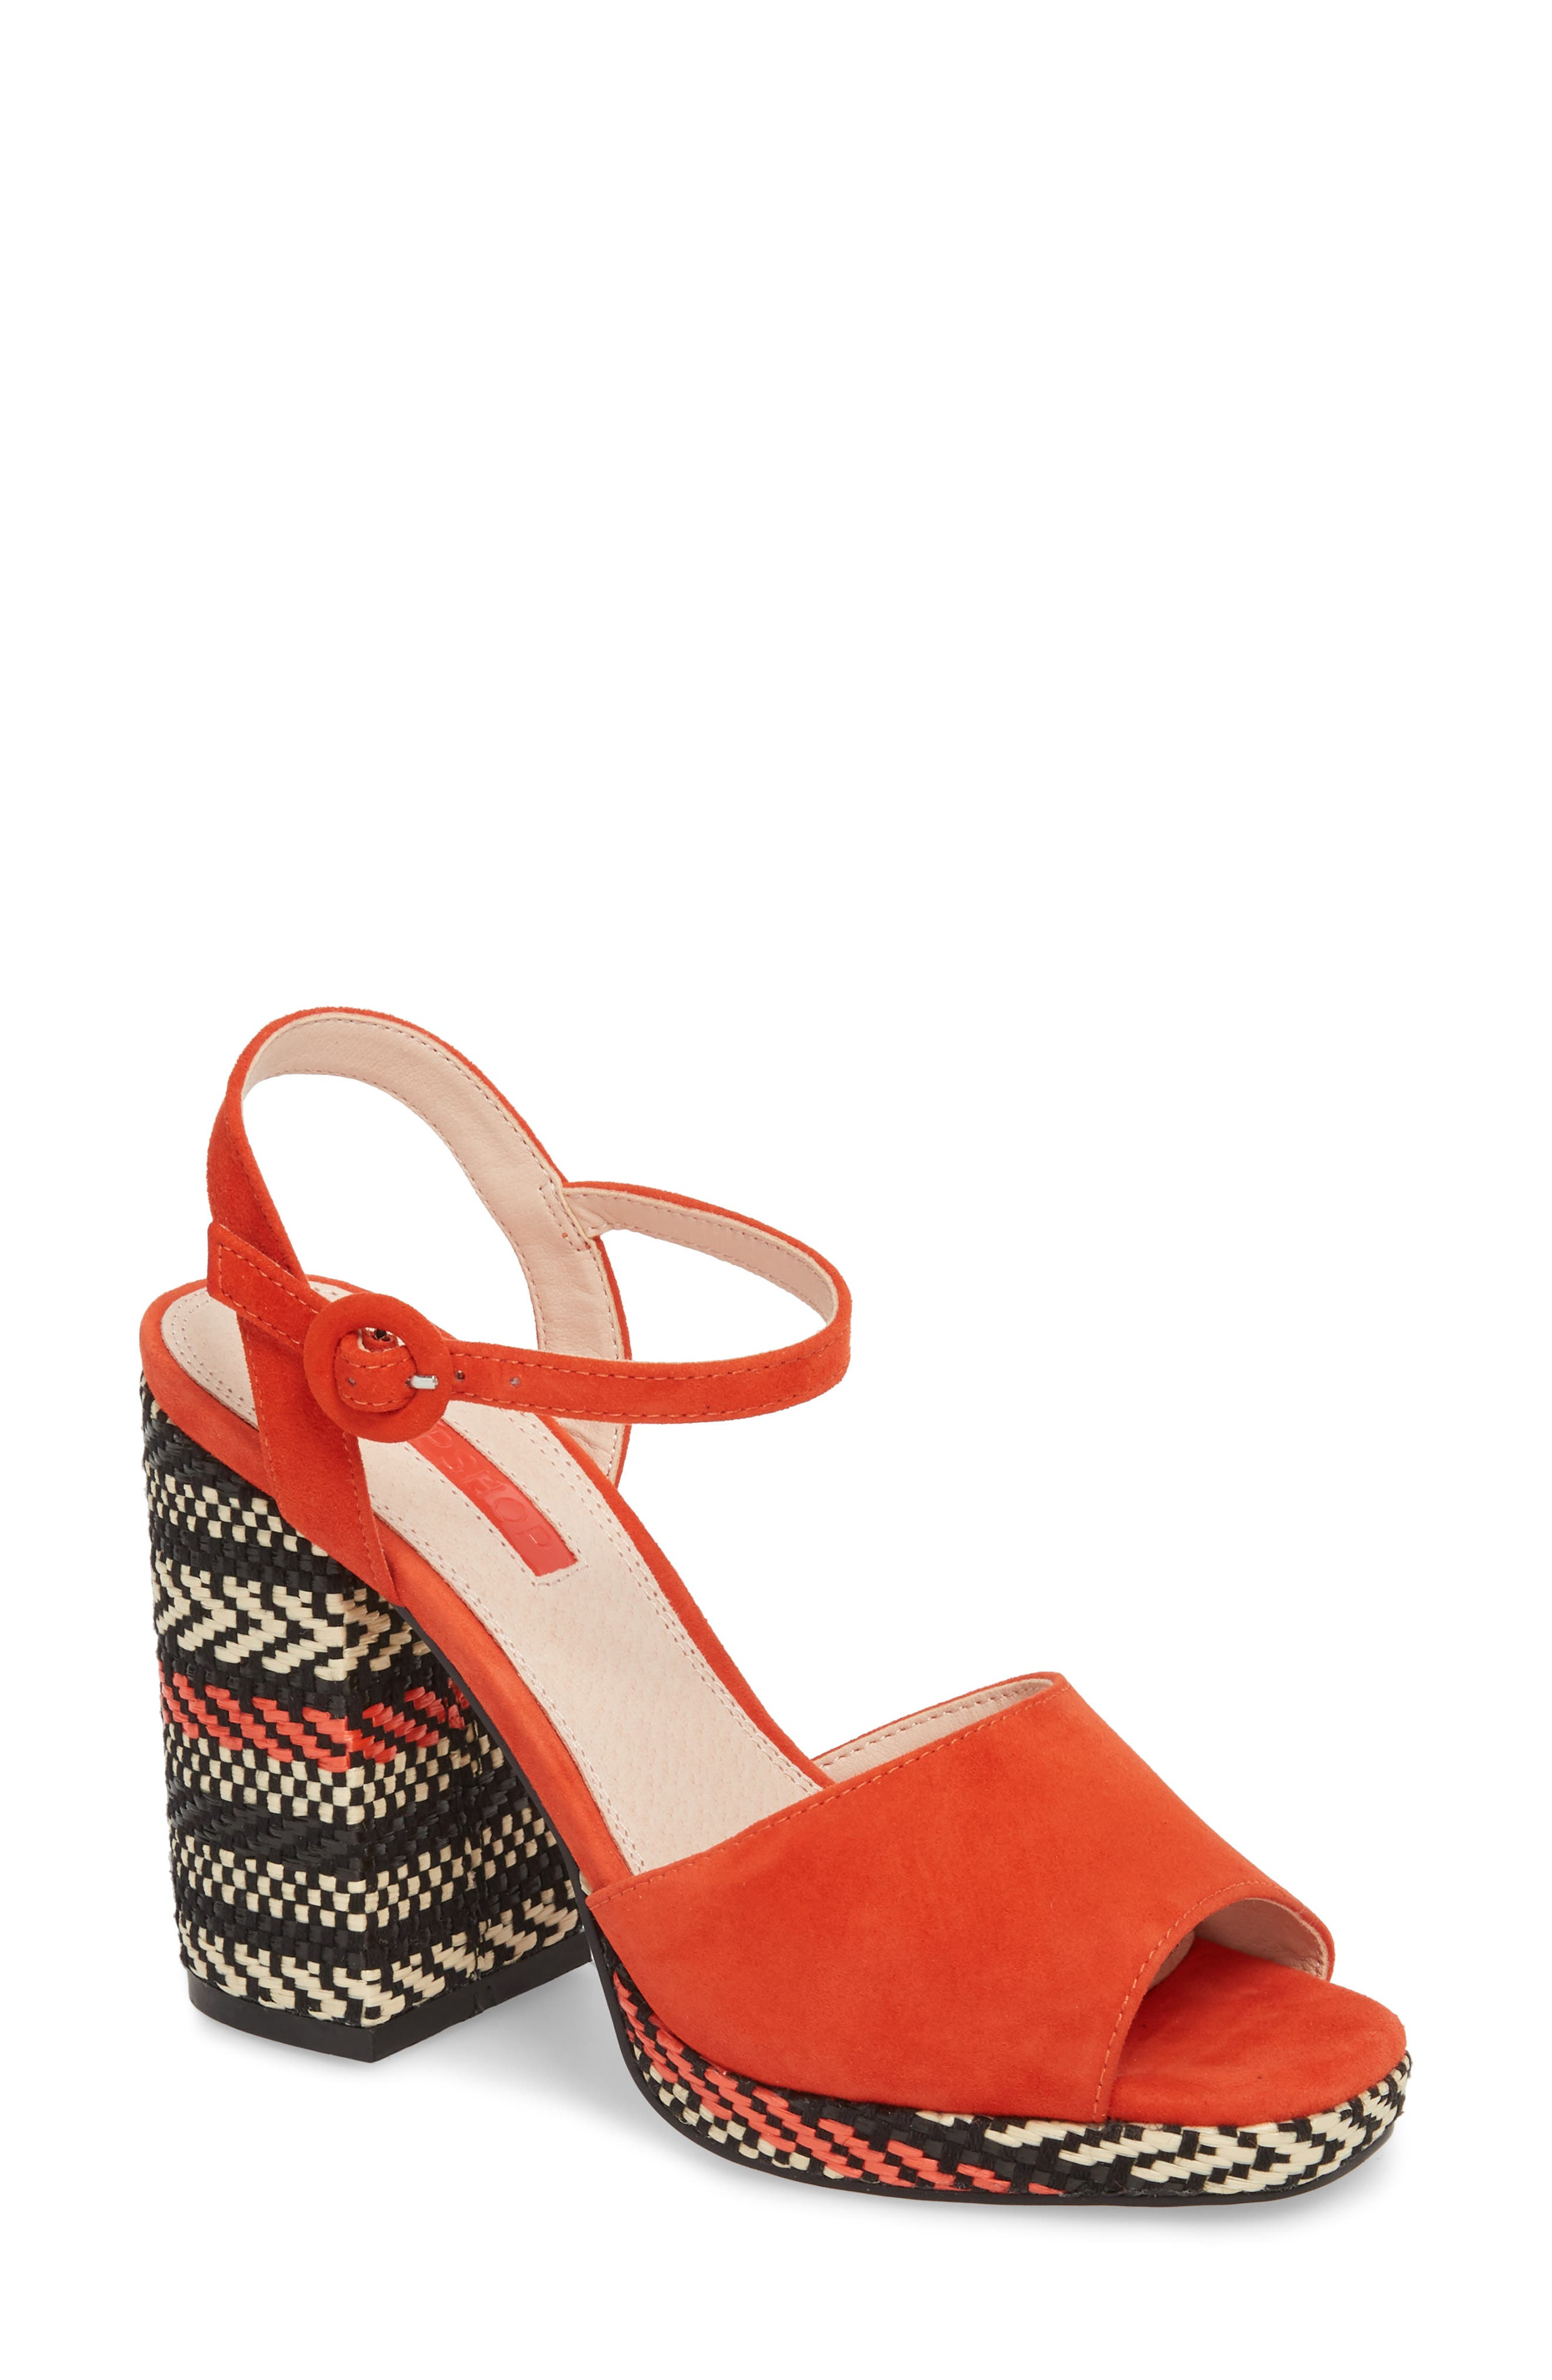 Laura Woven Block Heel Sandal,                             Main thumbnail 2, color,